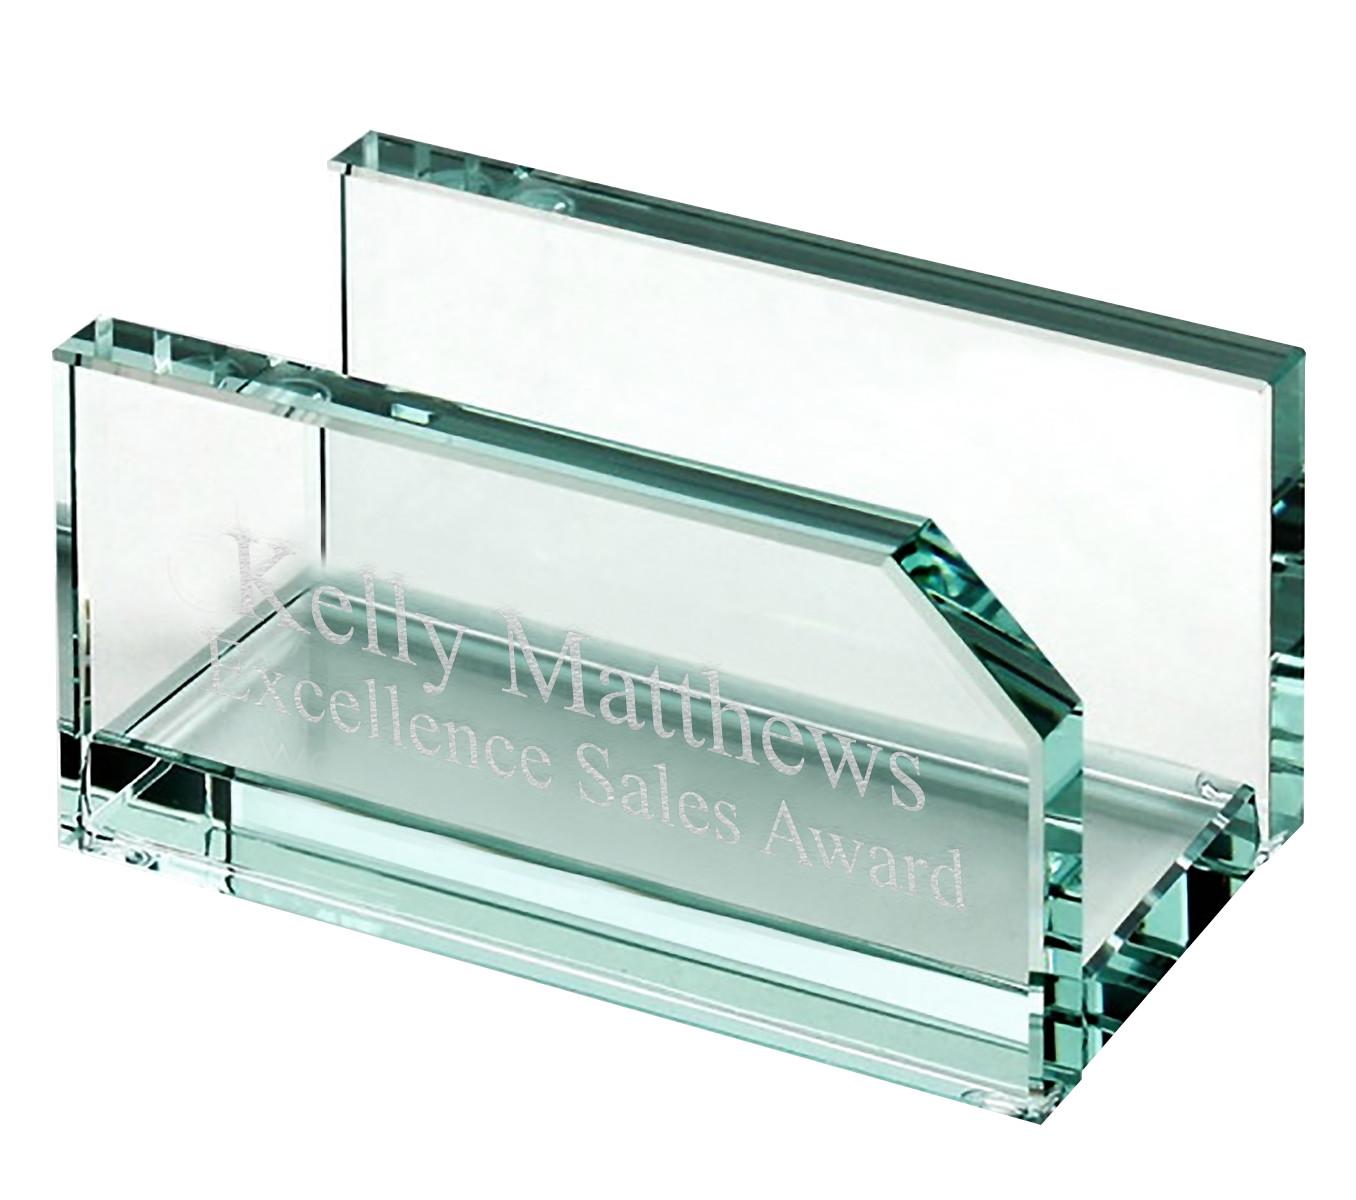 Executive Glass Business Card Holder